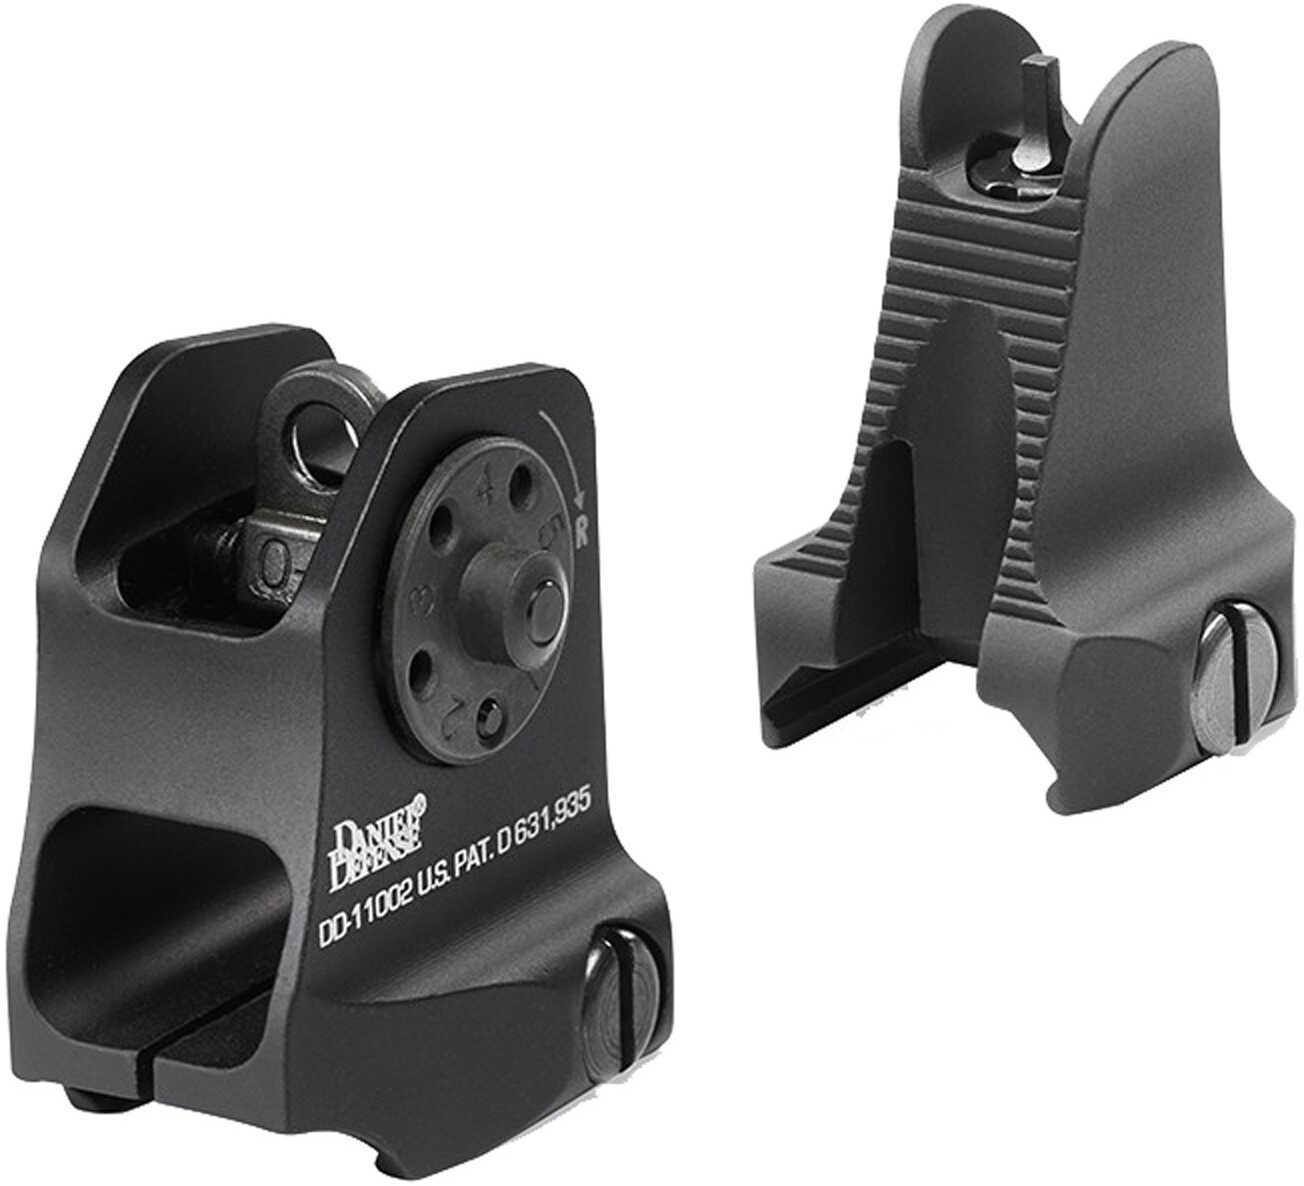 Daniel Defense Fixed Front/Rear Sight Combo Fits Picatinny Black Finish 19-088-09116